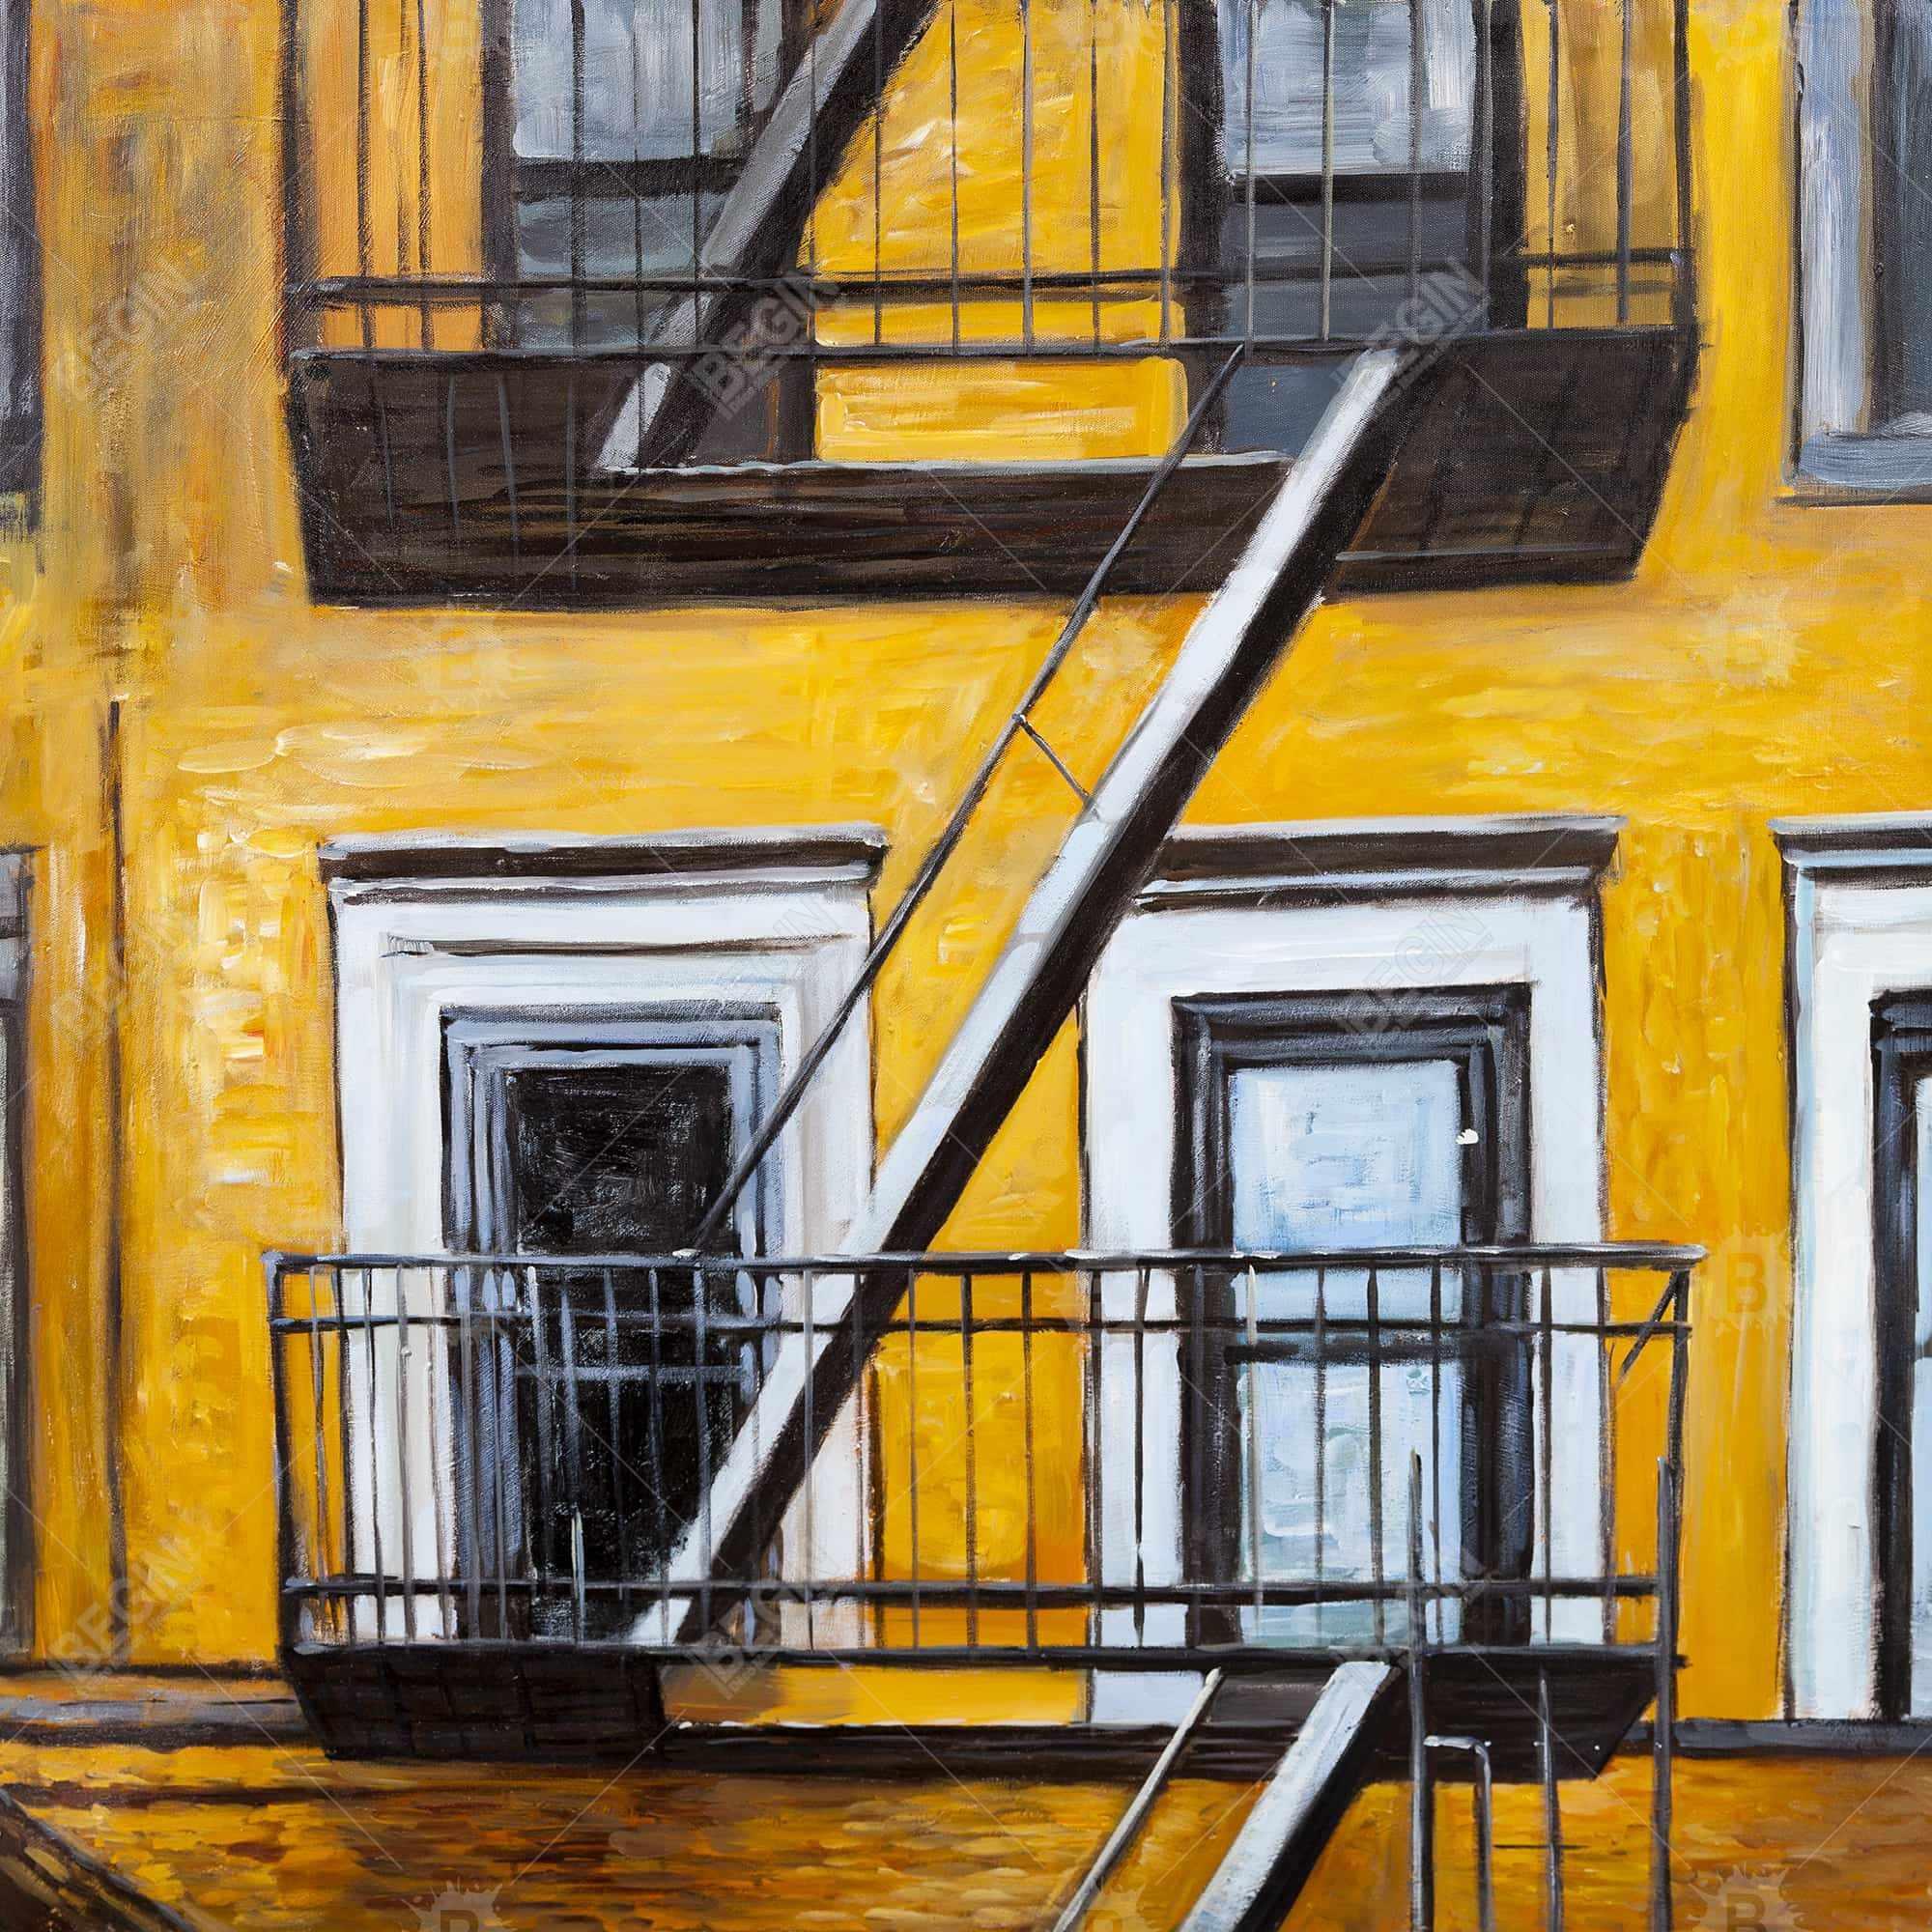 Building old fire escape